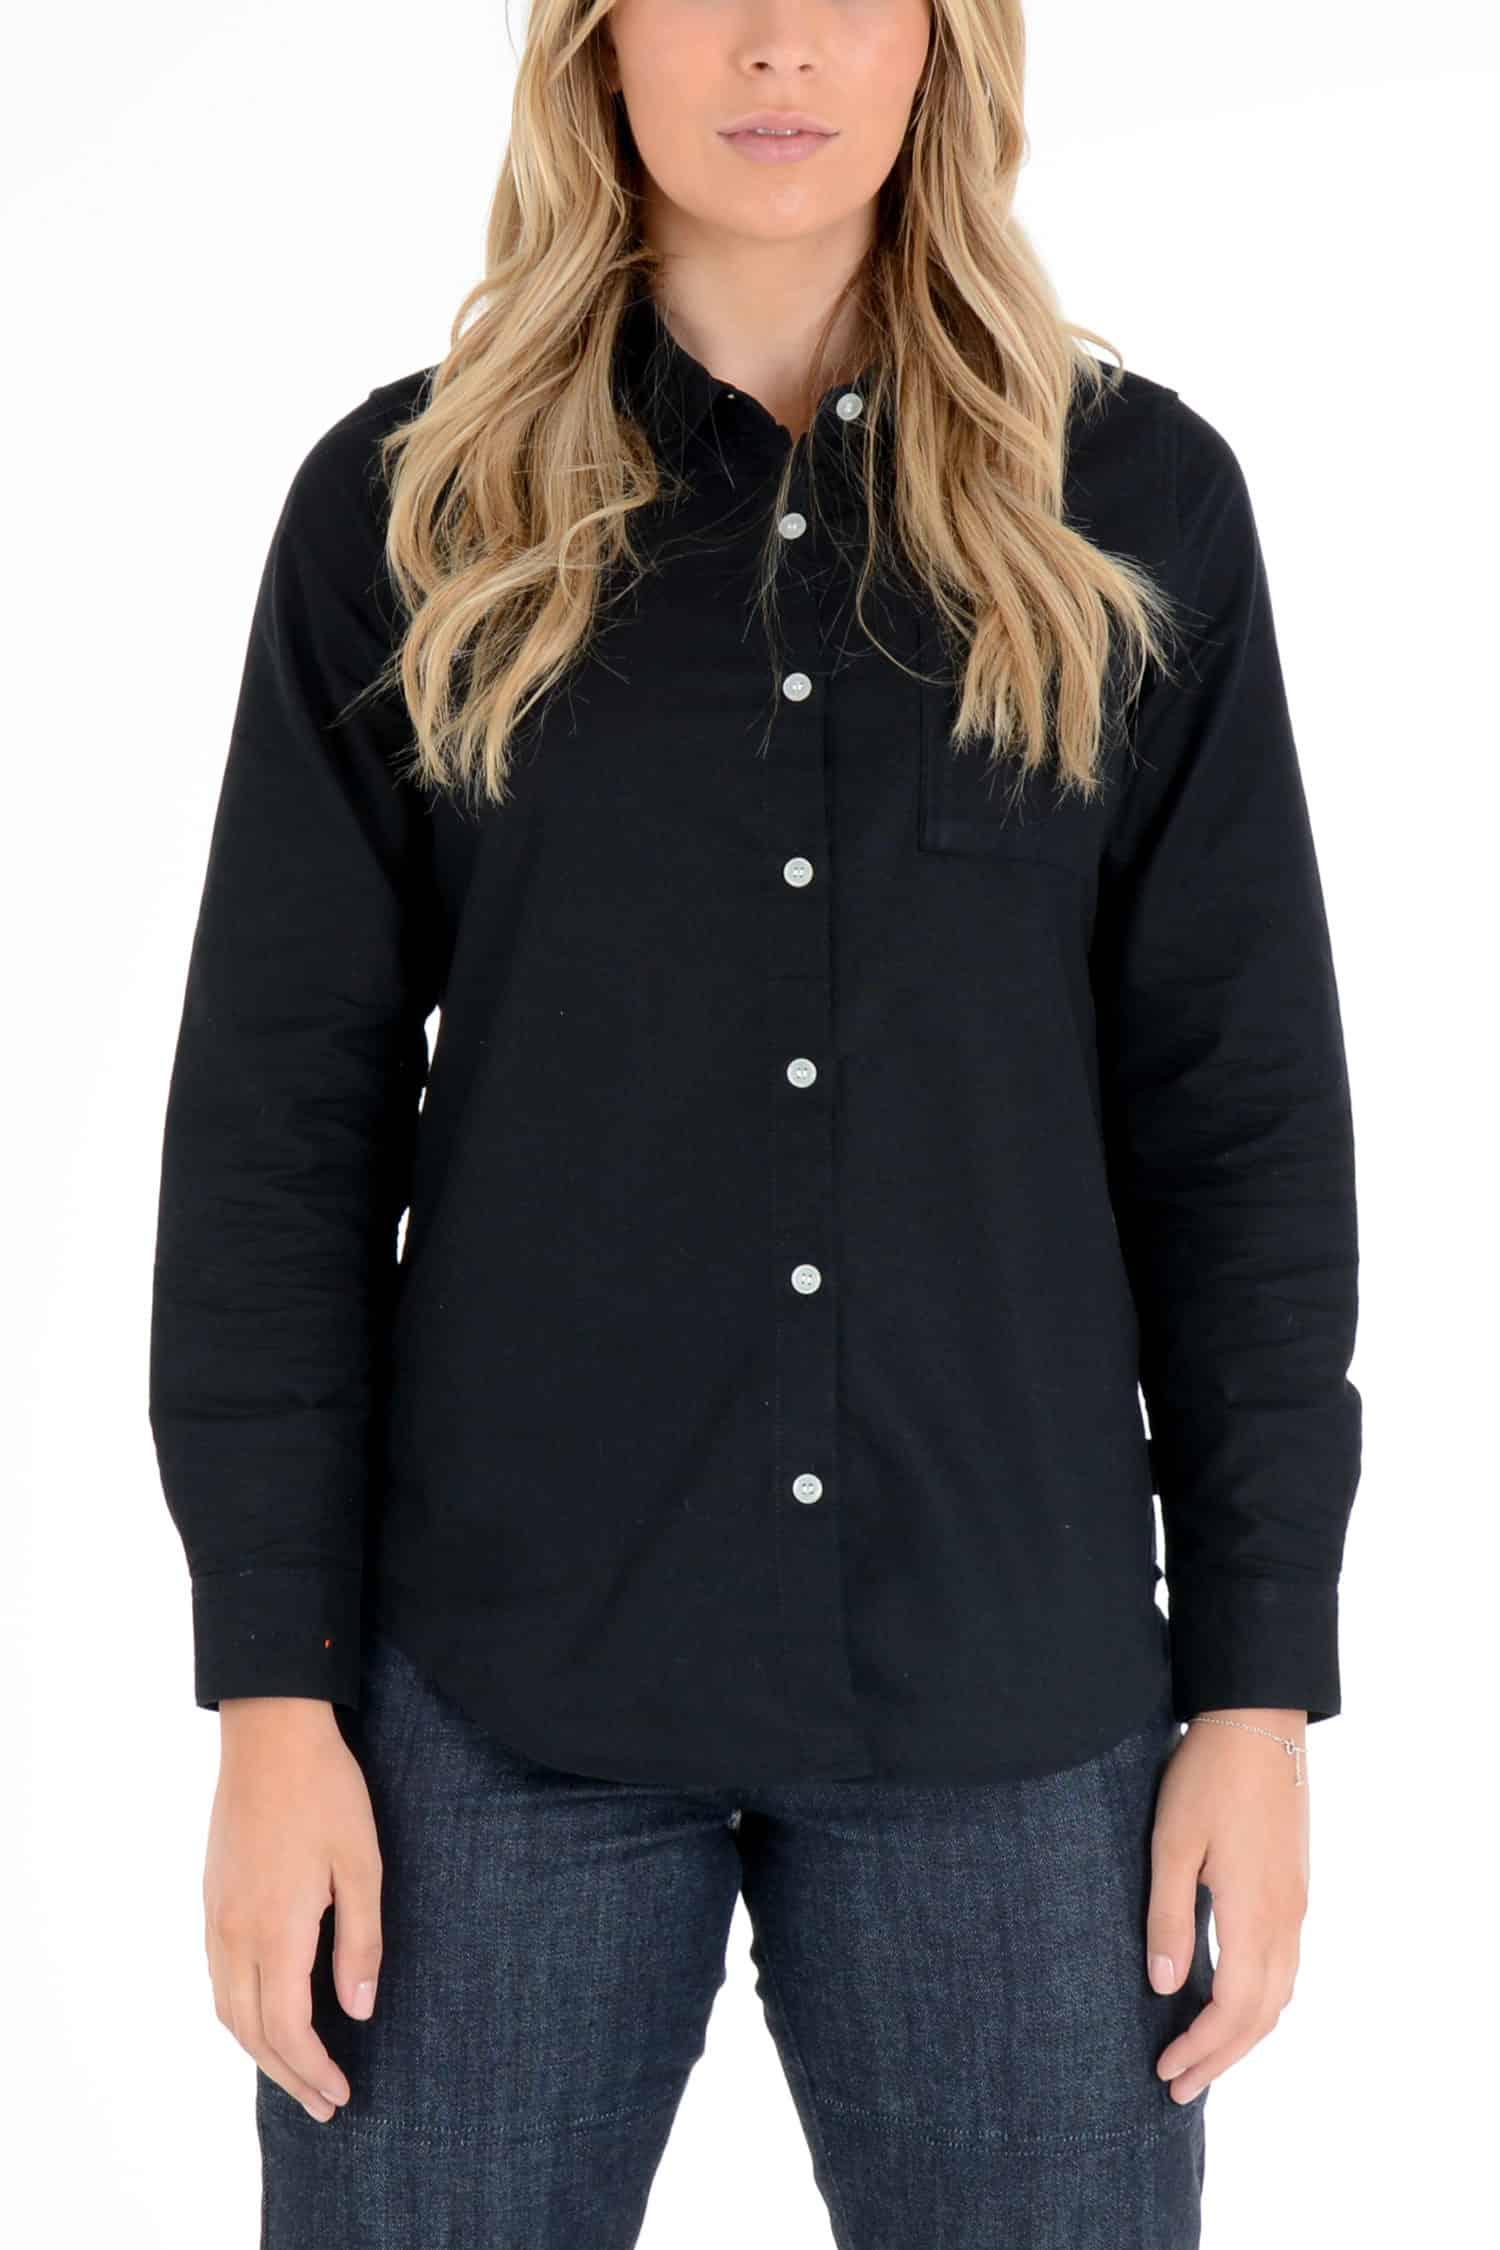 Skyline Black – Women's Long Sleeve shirt